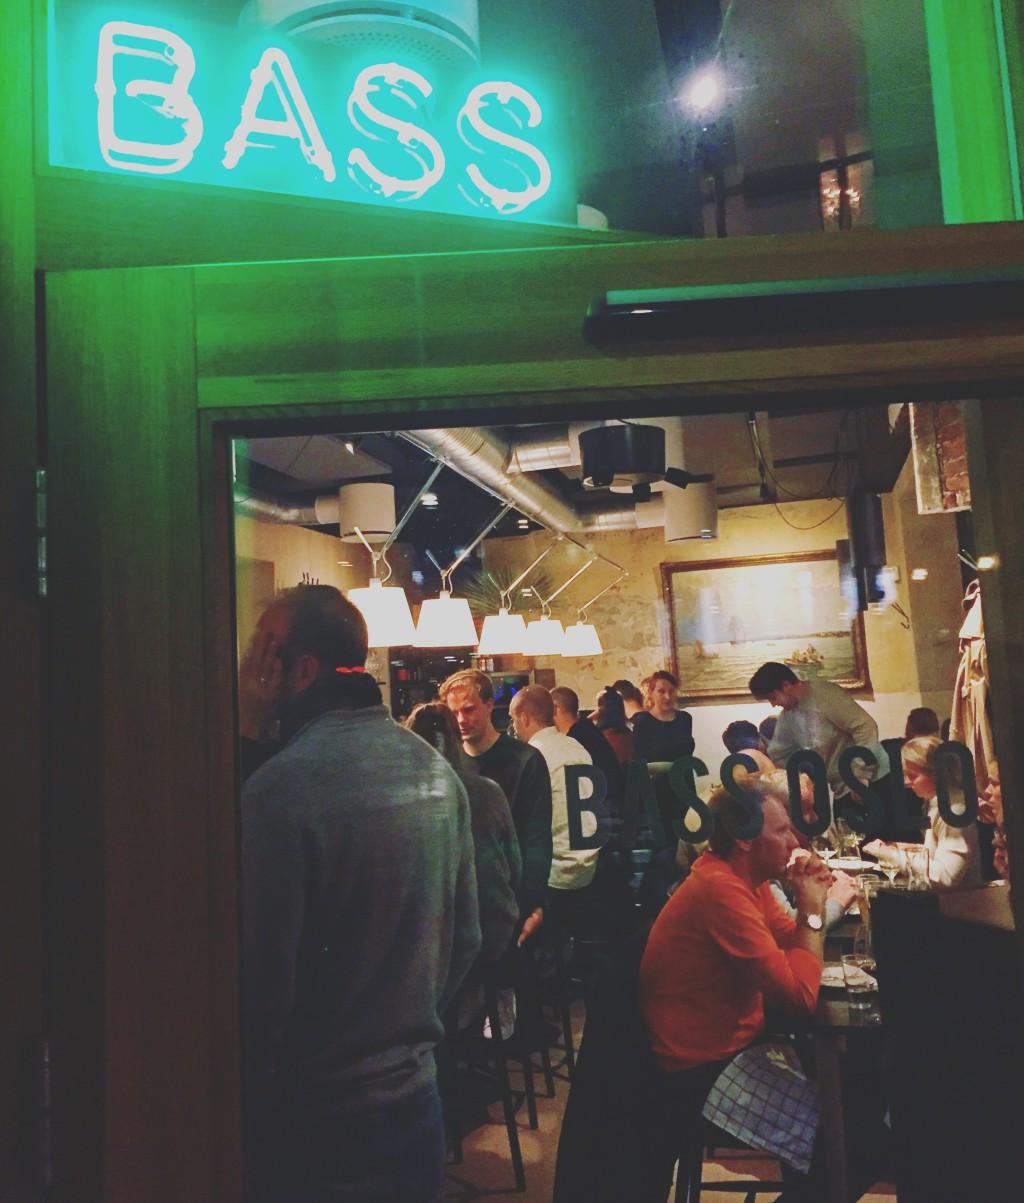 bass-oslo-grunerlokka-restaurant